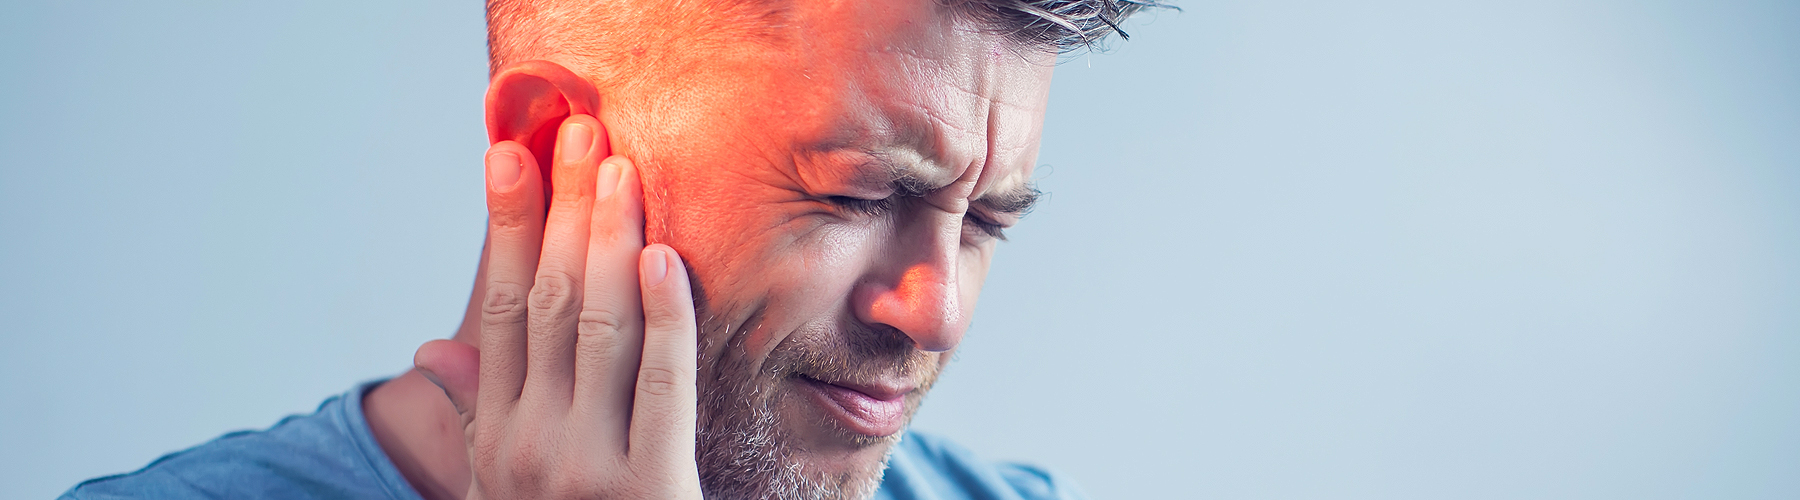 ear disorders